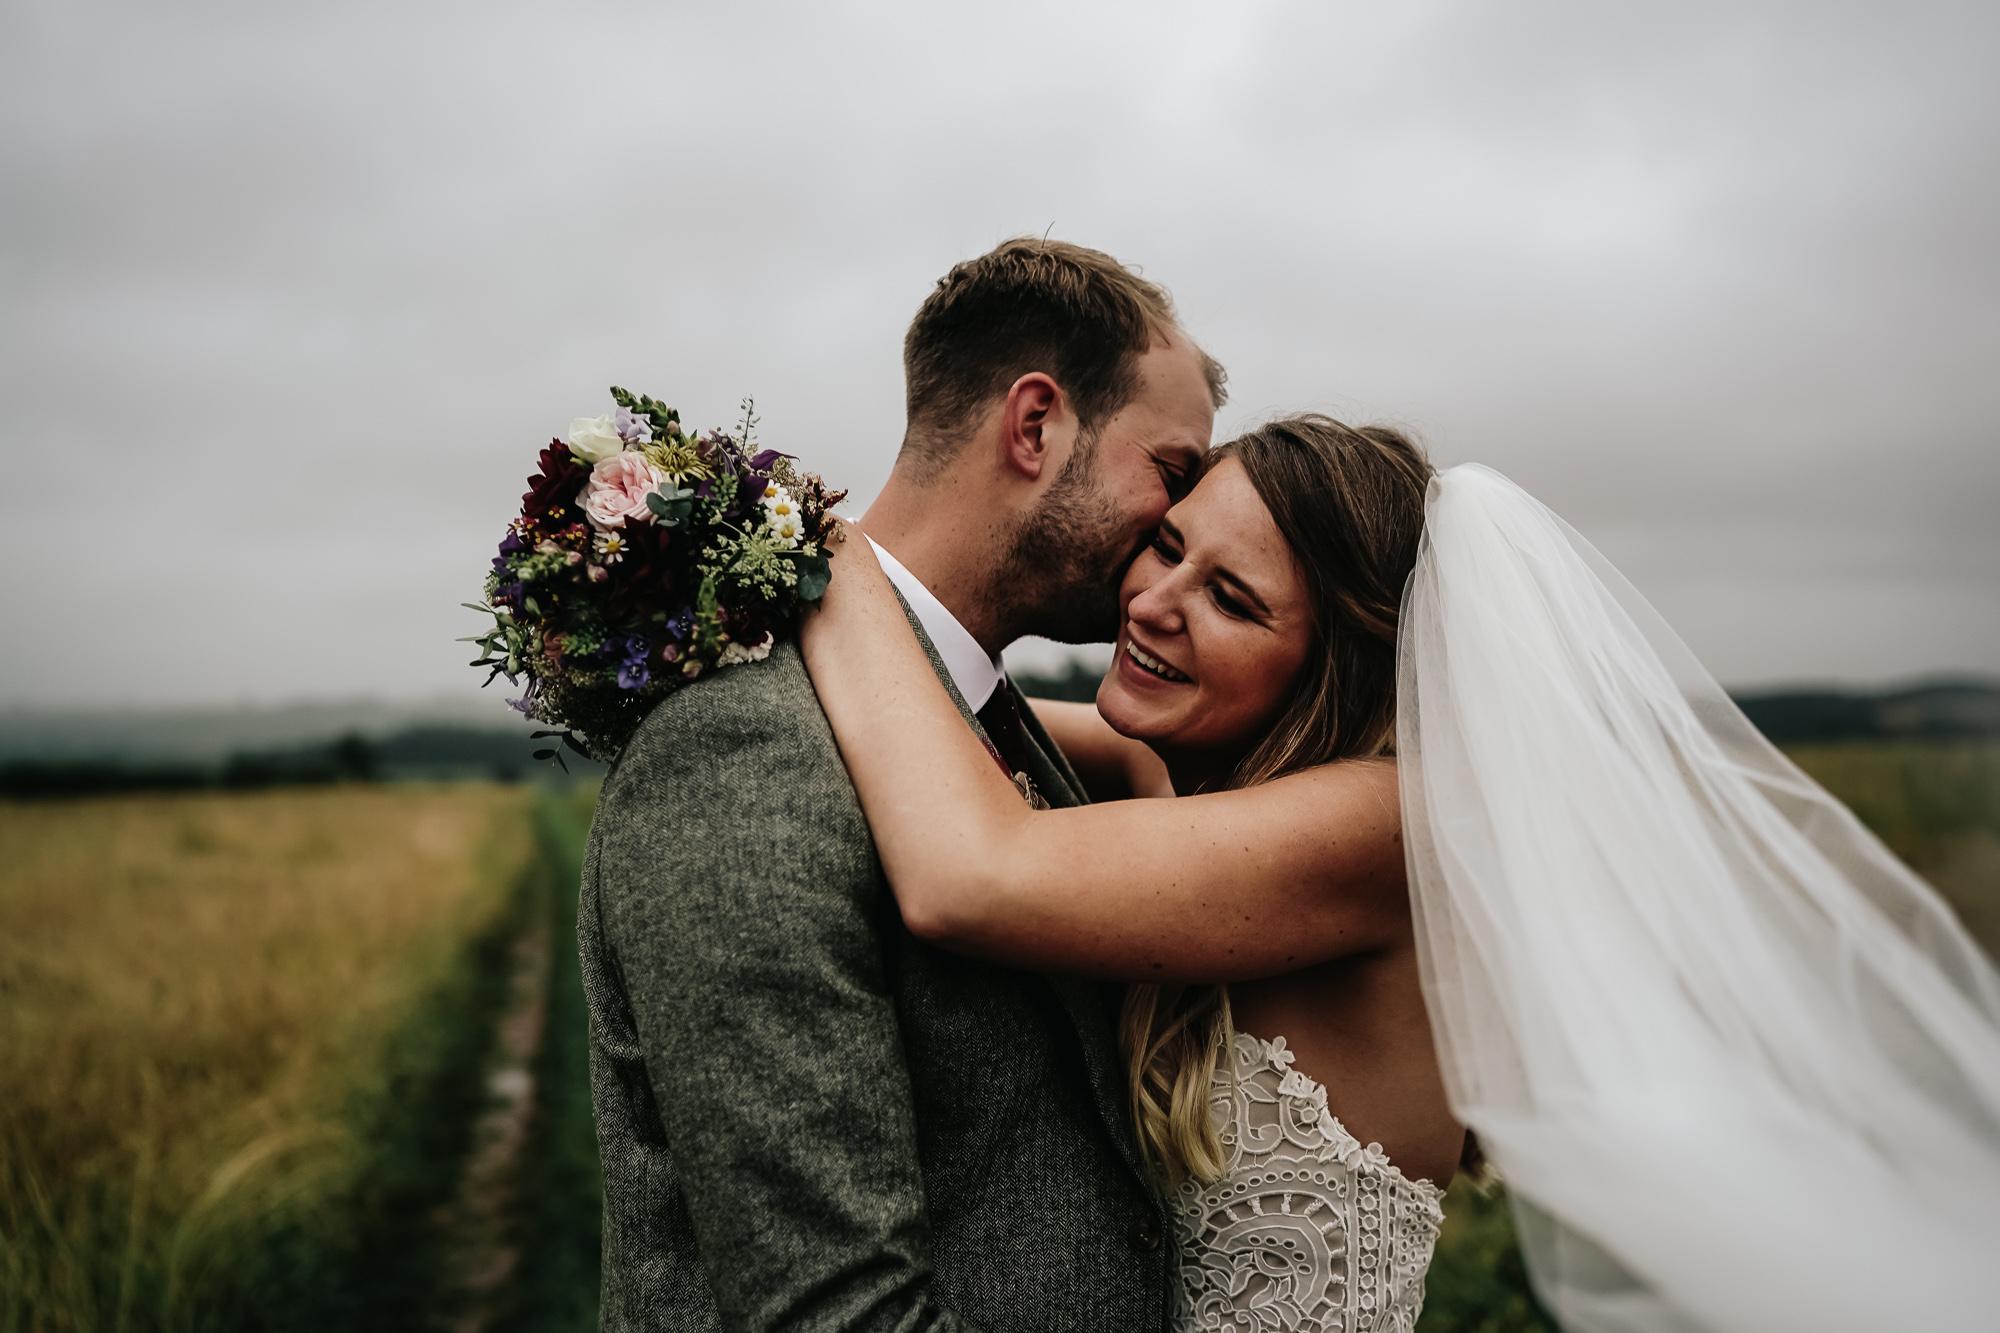 High Barn Wedding photographer lake distect penrith documentry wedding photography (51 of 57).jpg